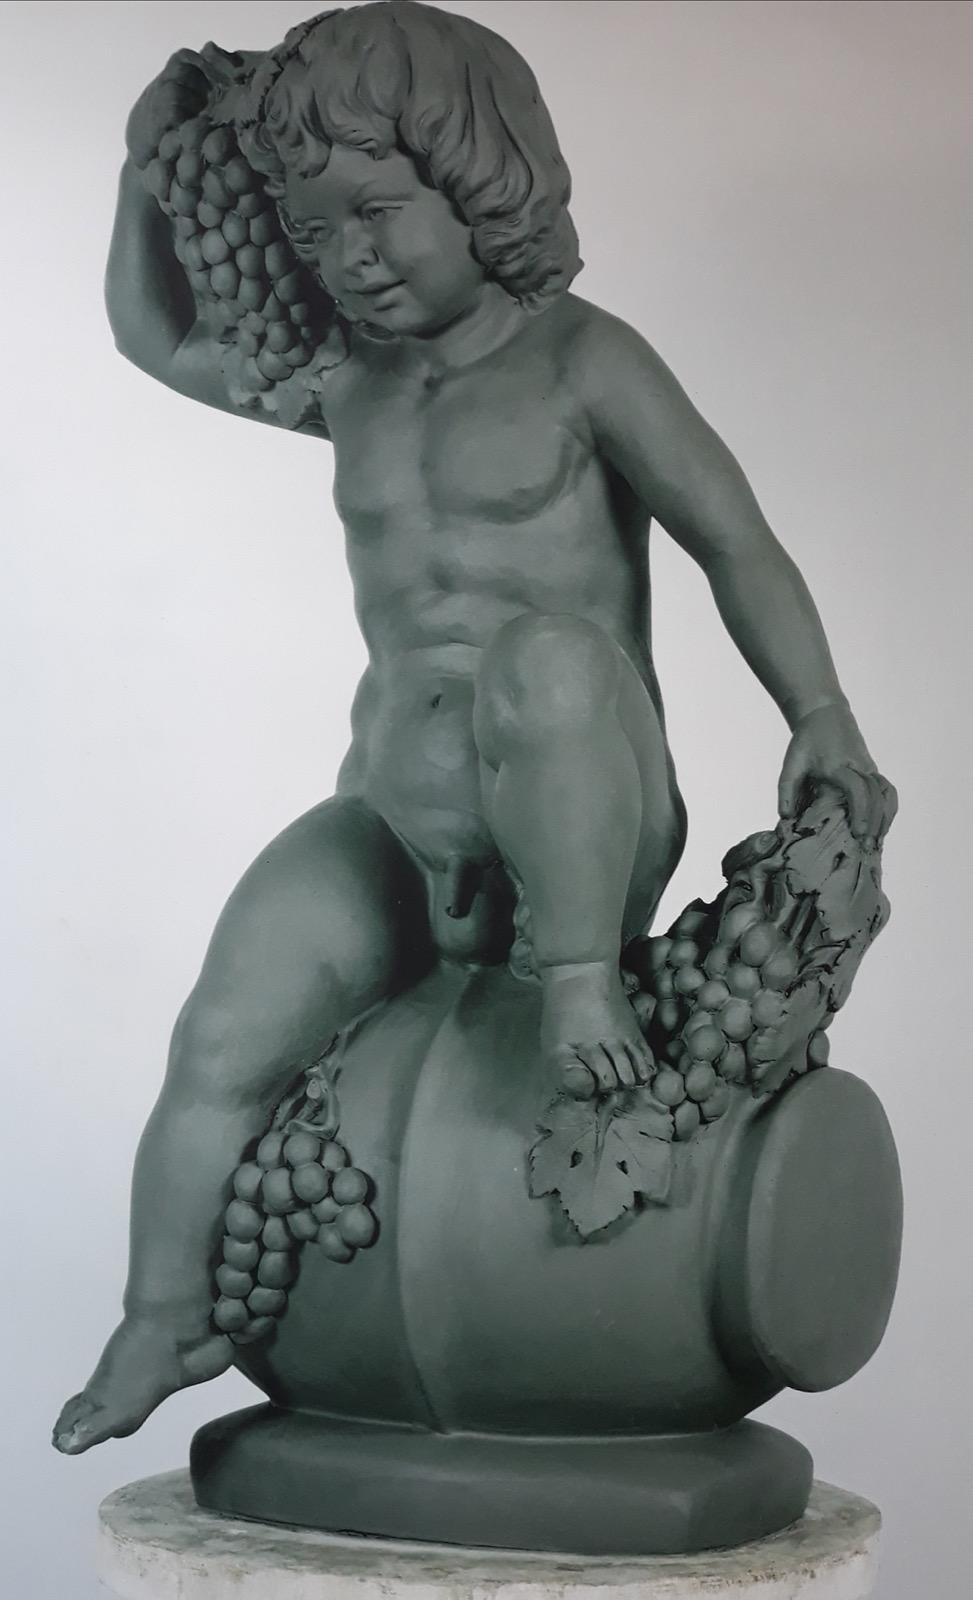 Arteforma